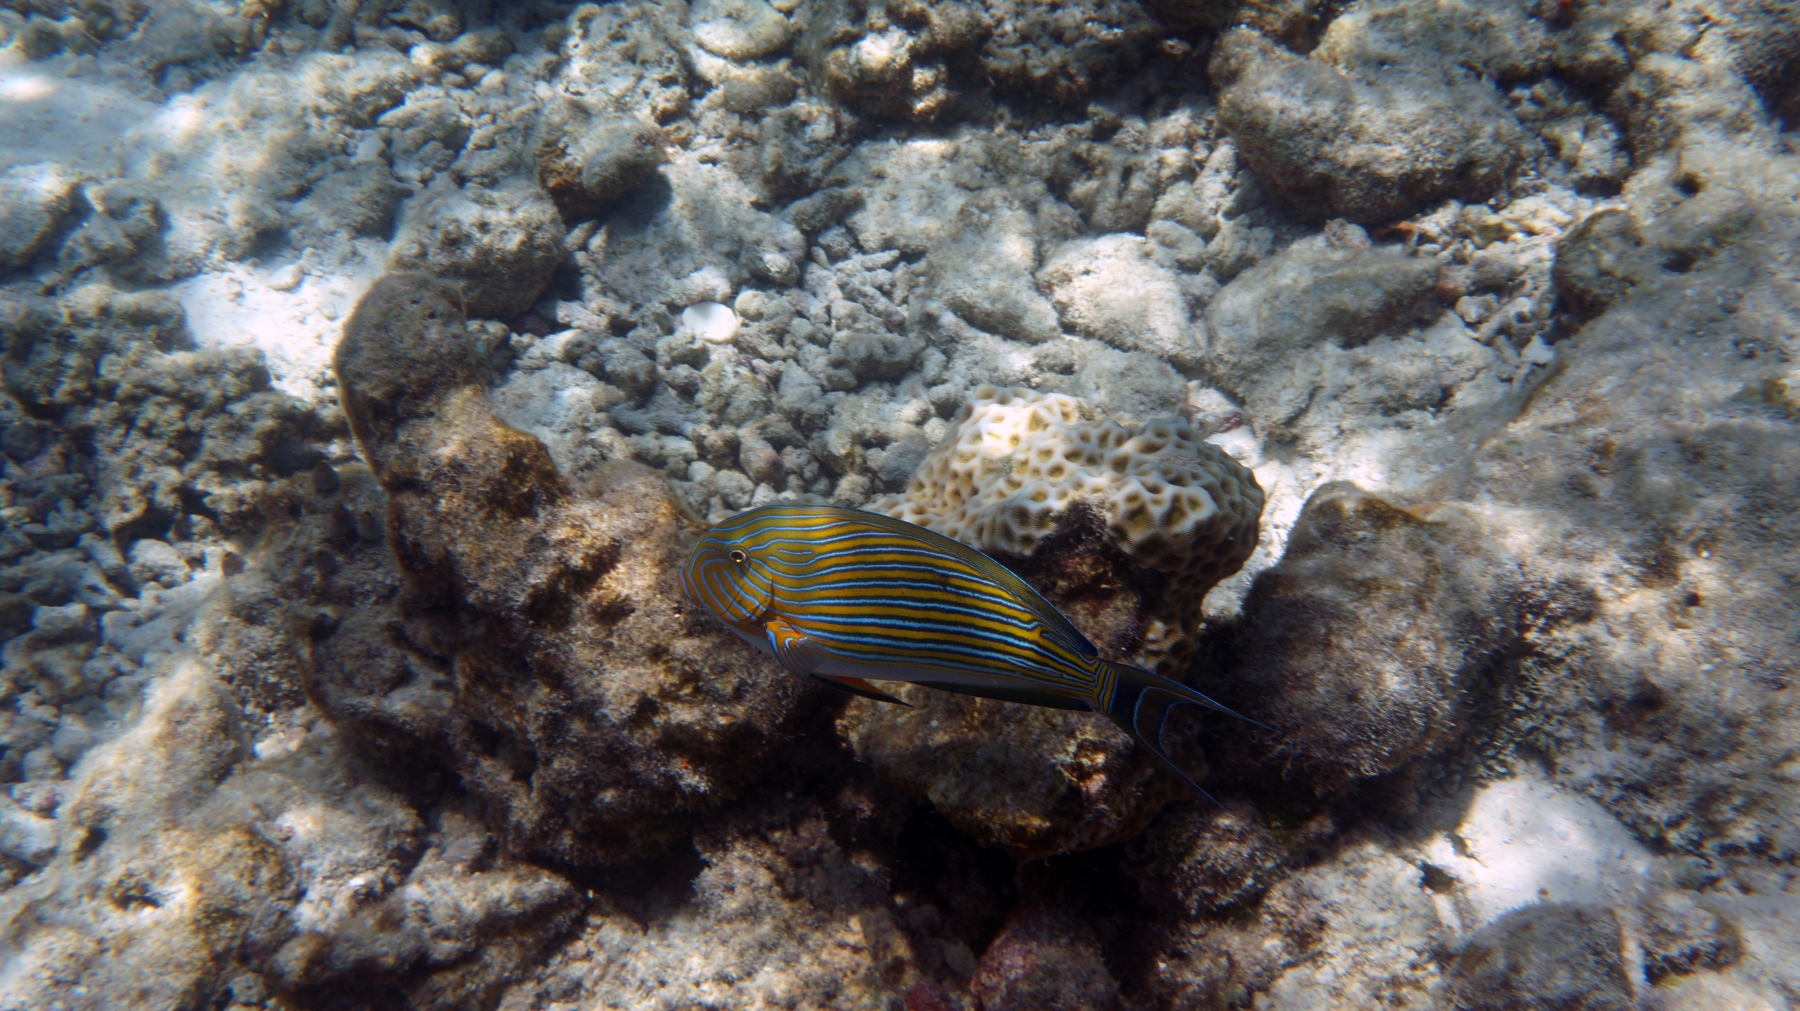 Acanthurus_lineatus_001_C_Peces-Cirujano_L_Maldivas_U_Sebas_02072015